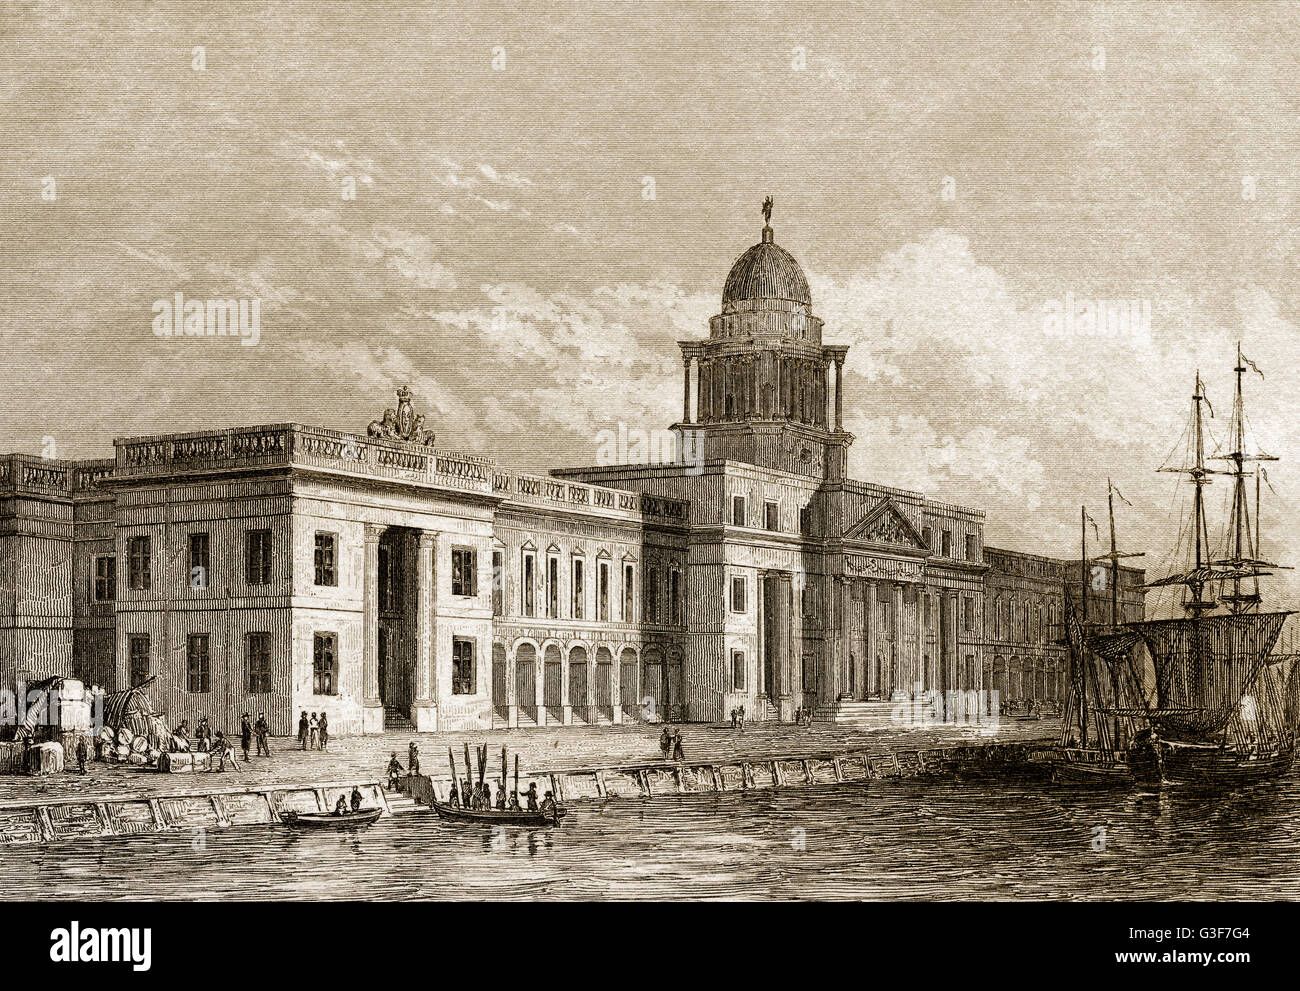 Custom House in Dublin, Ireland, 19th century - Stock Image